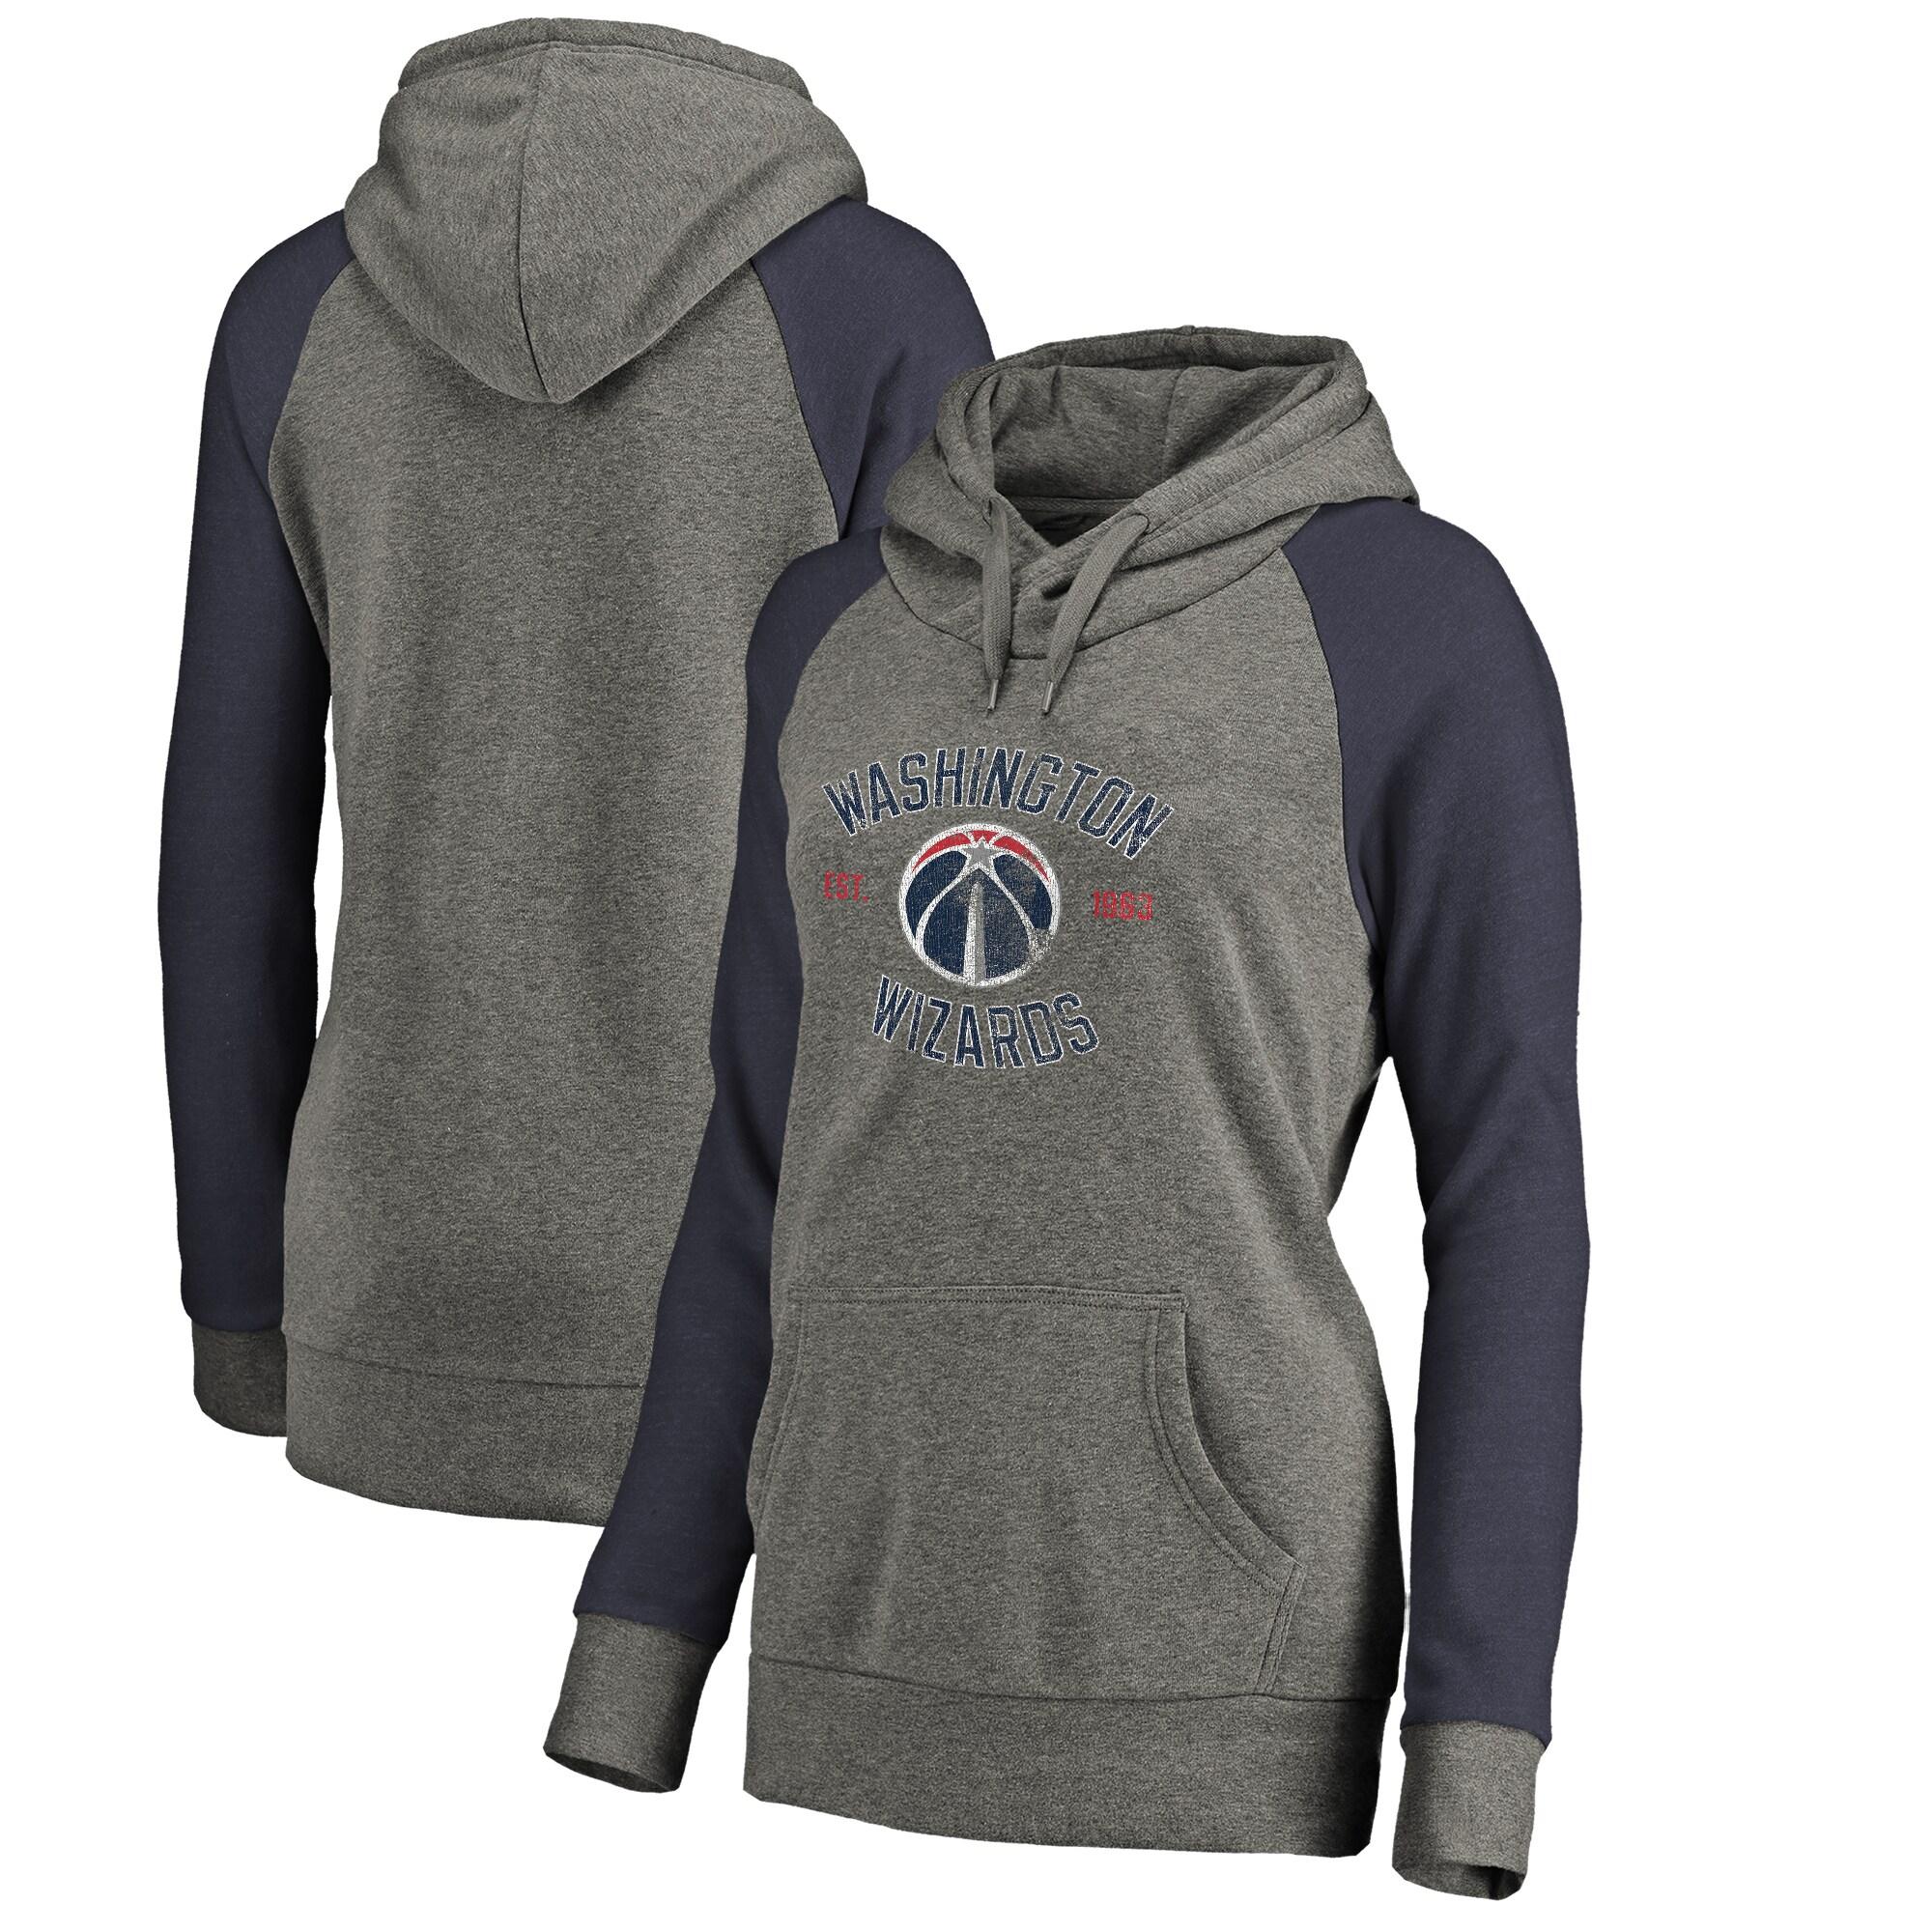 Washington Wizards Fanatics Branded Women's Heritage Tri-Blend Raglan Plus Size Pullover Hoodie - Heathered Gray